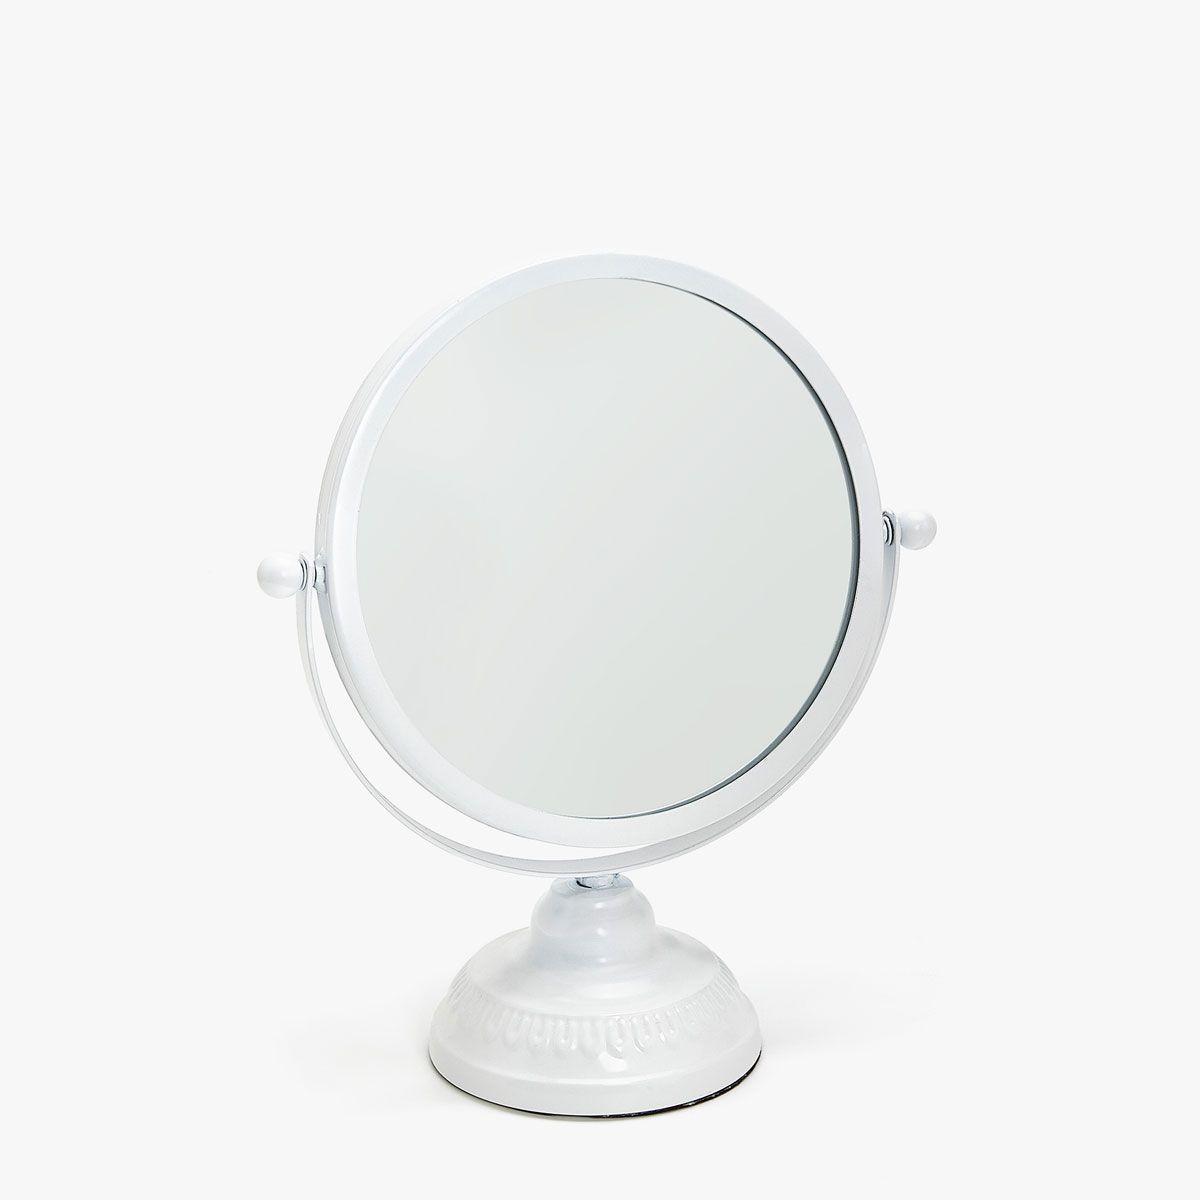 Round mirror with base   Round mirrors, Bath accessories and Bath